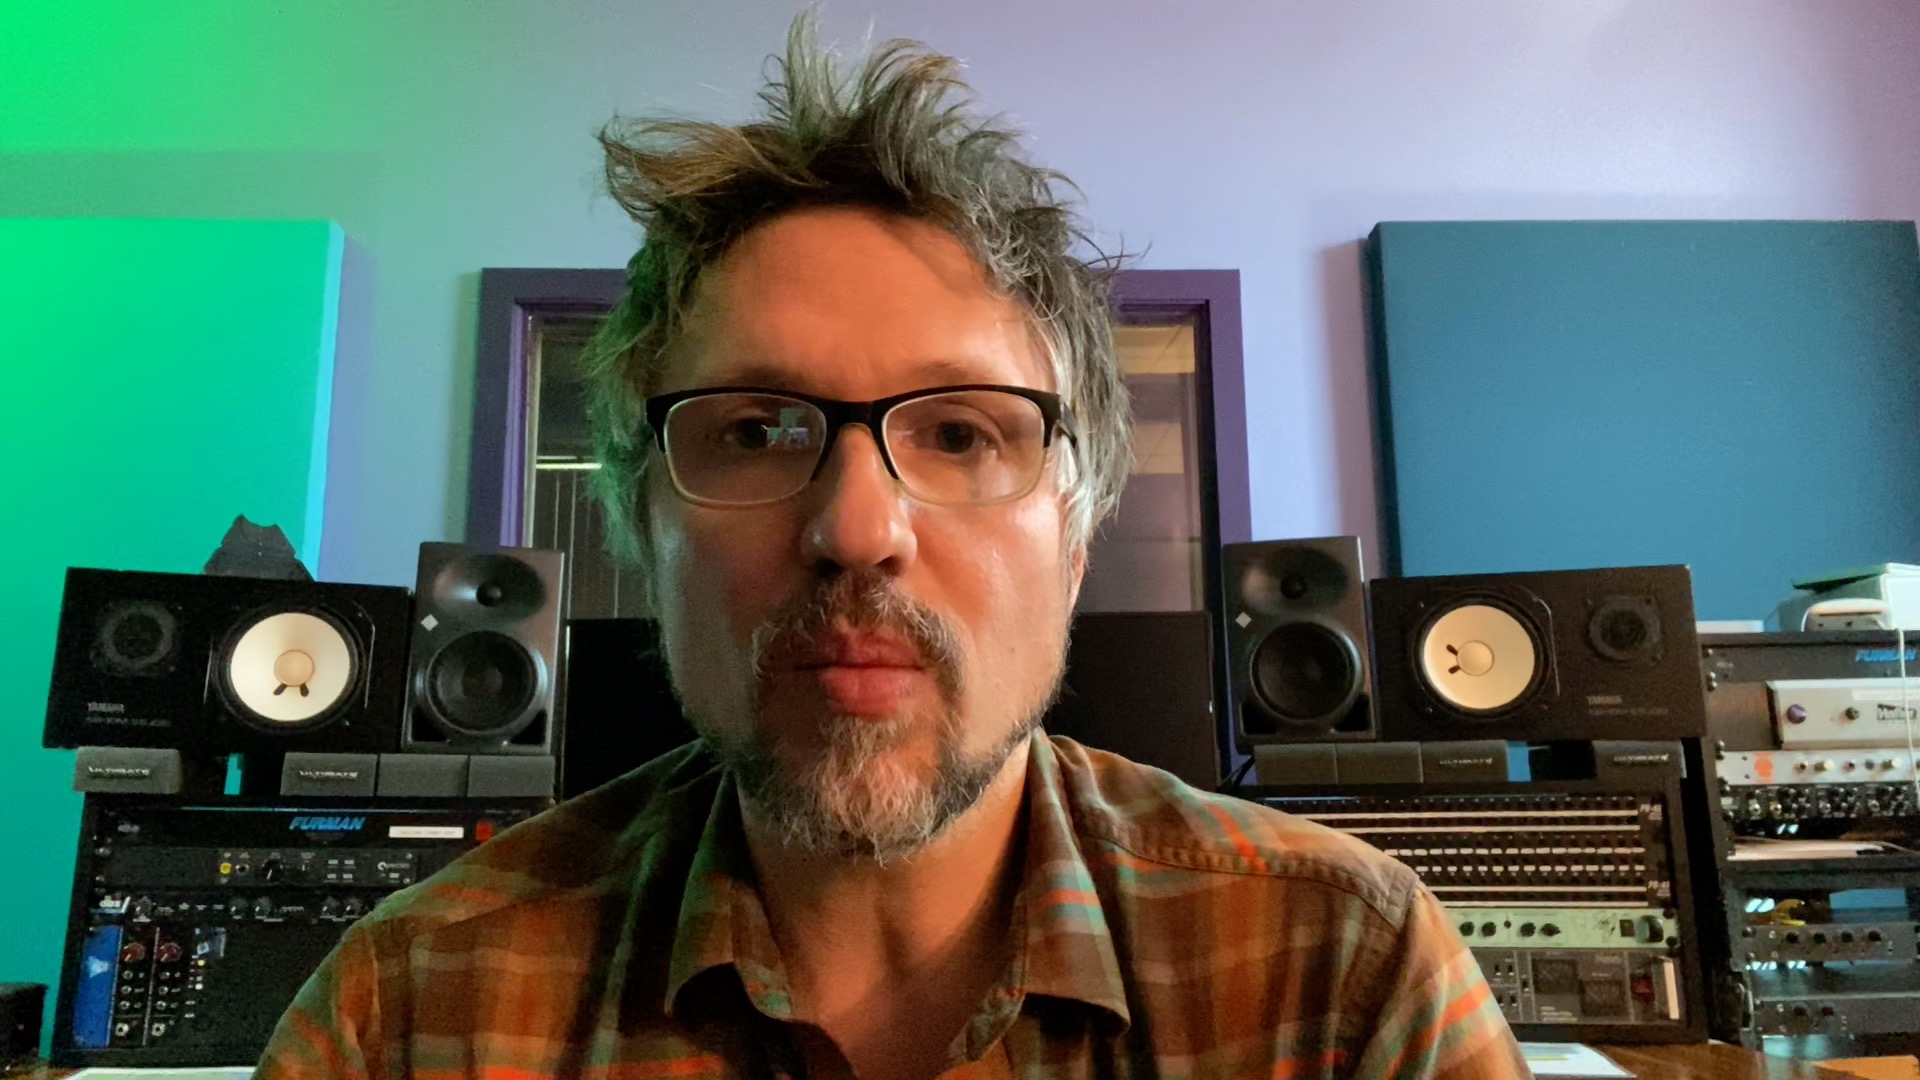 Why I'm Closing the Recording Studio – Vlog